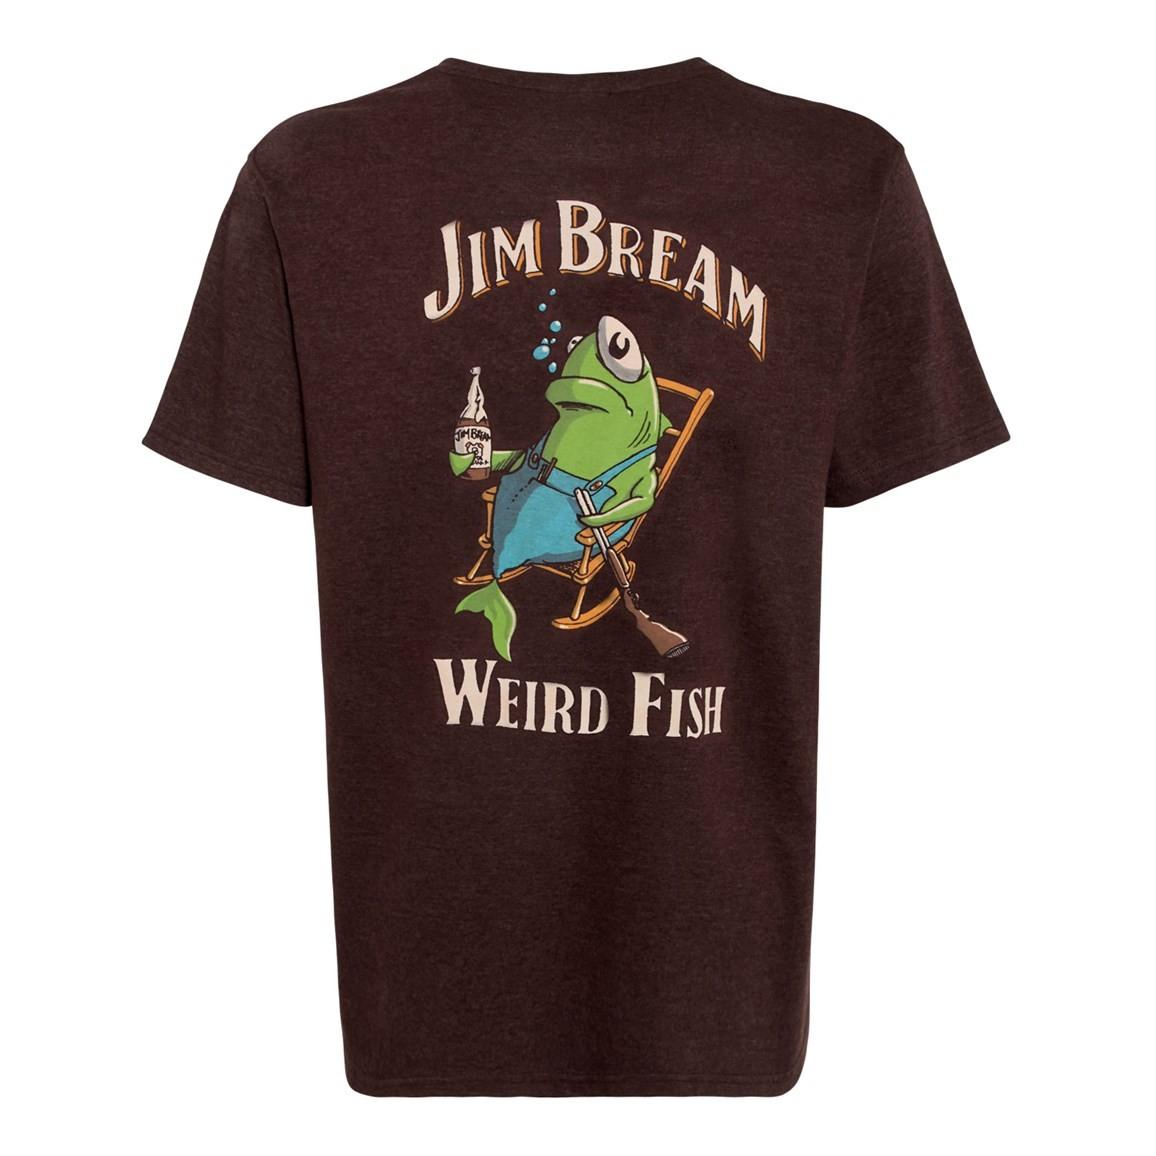 Jim Bream Printed Artist T-Shirt Conker Marl